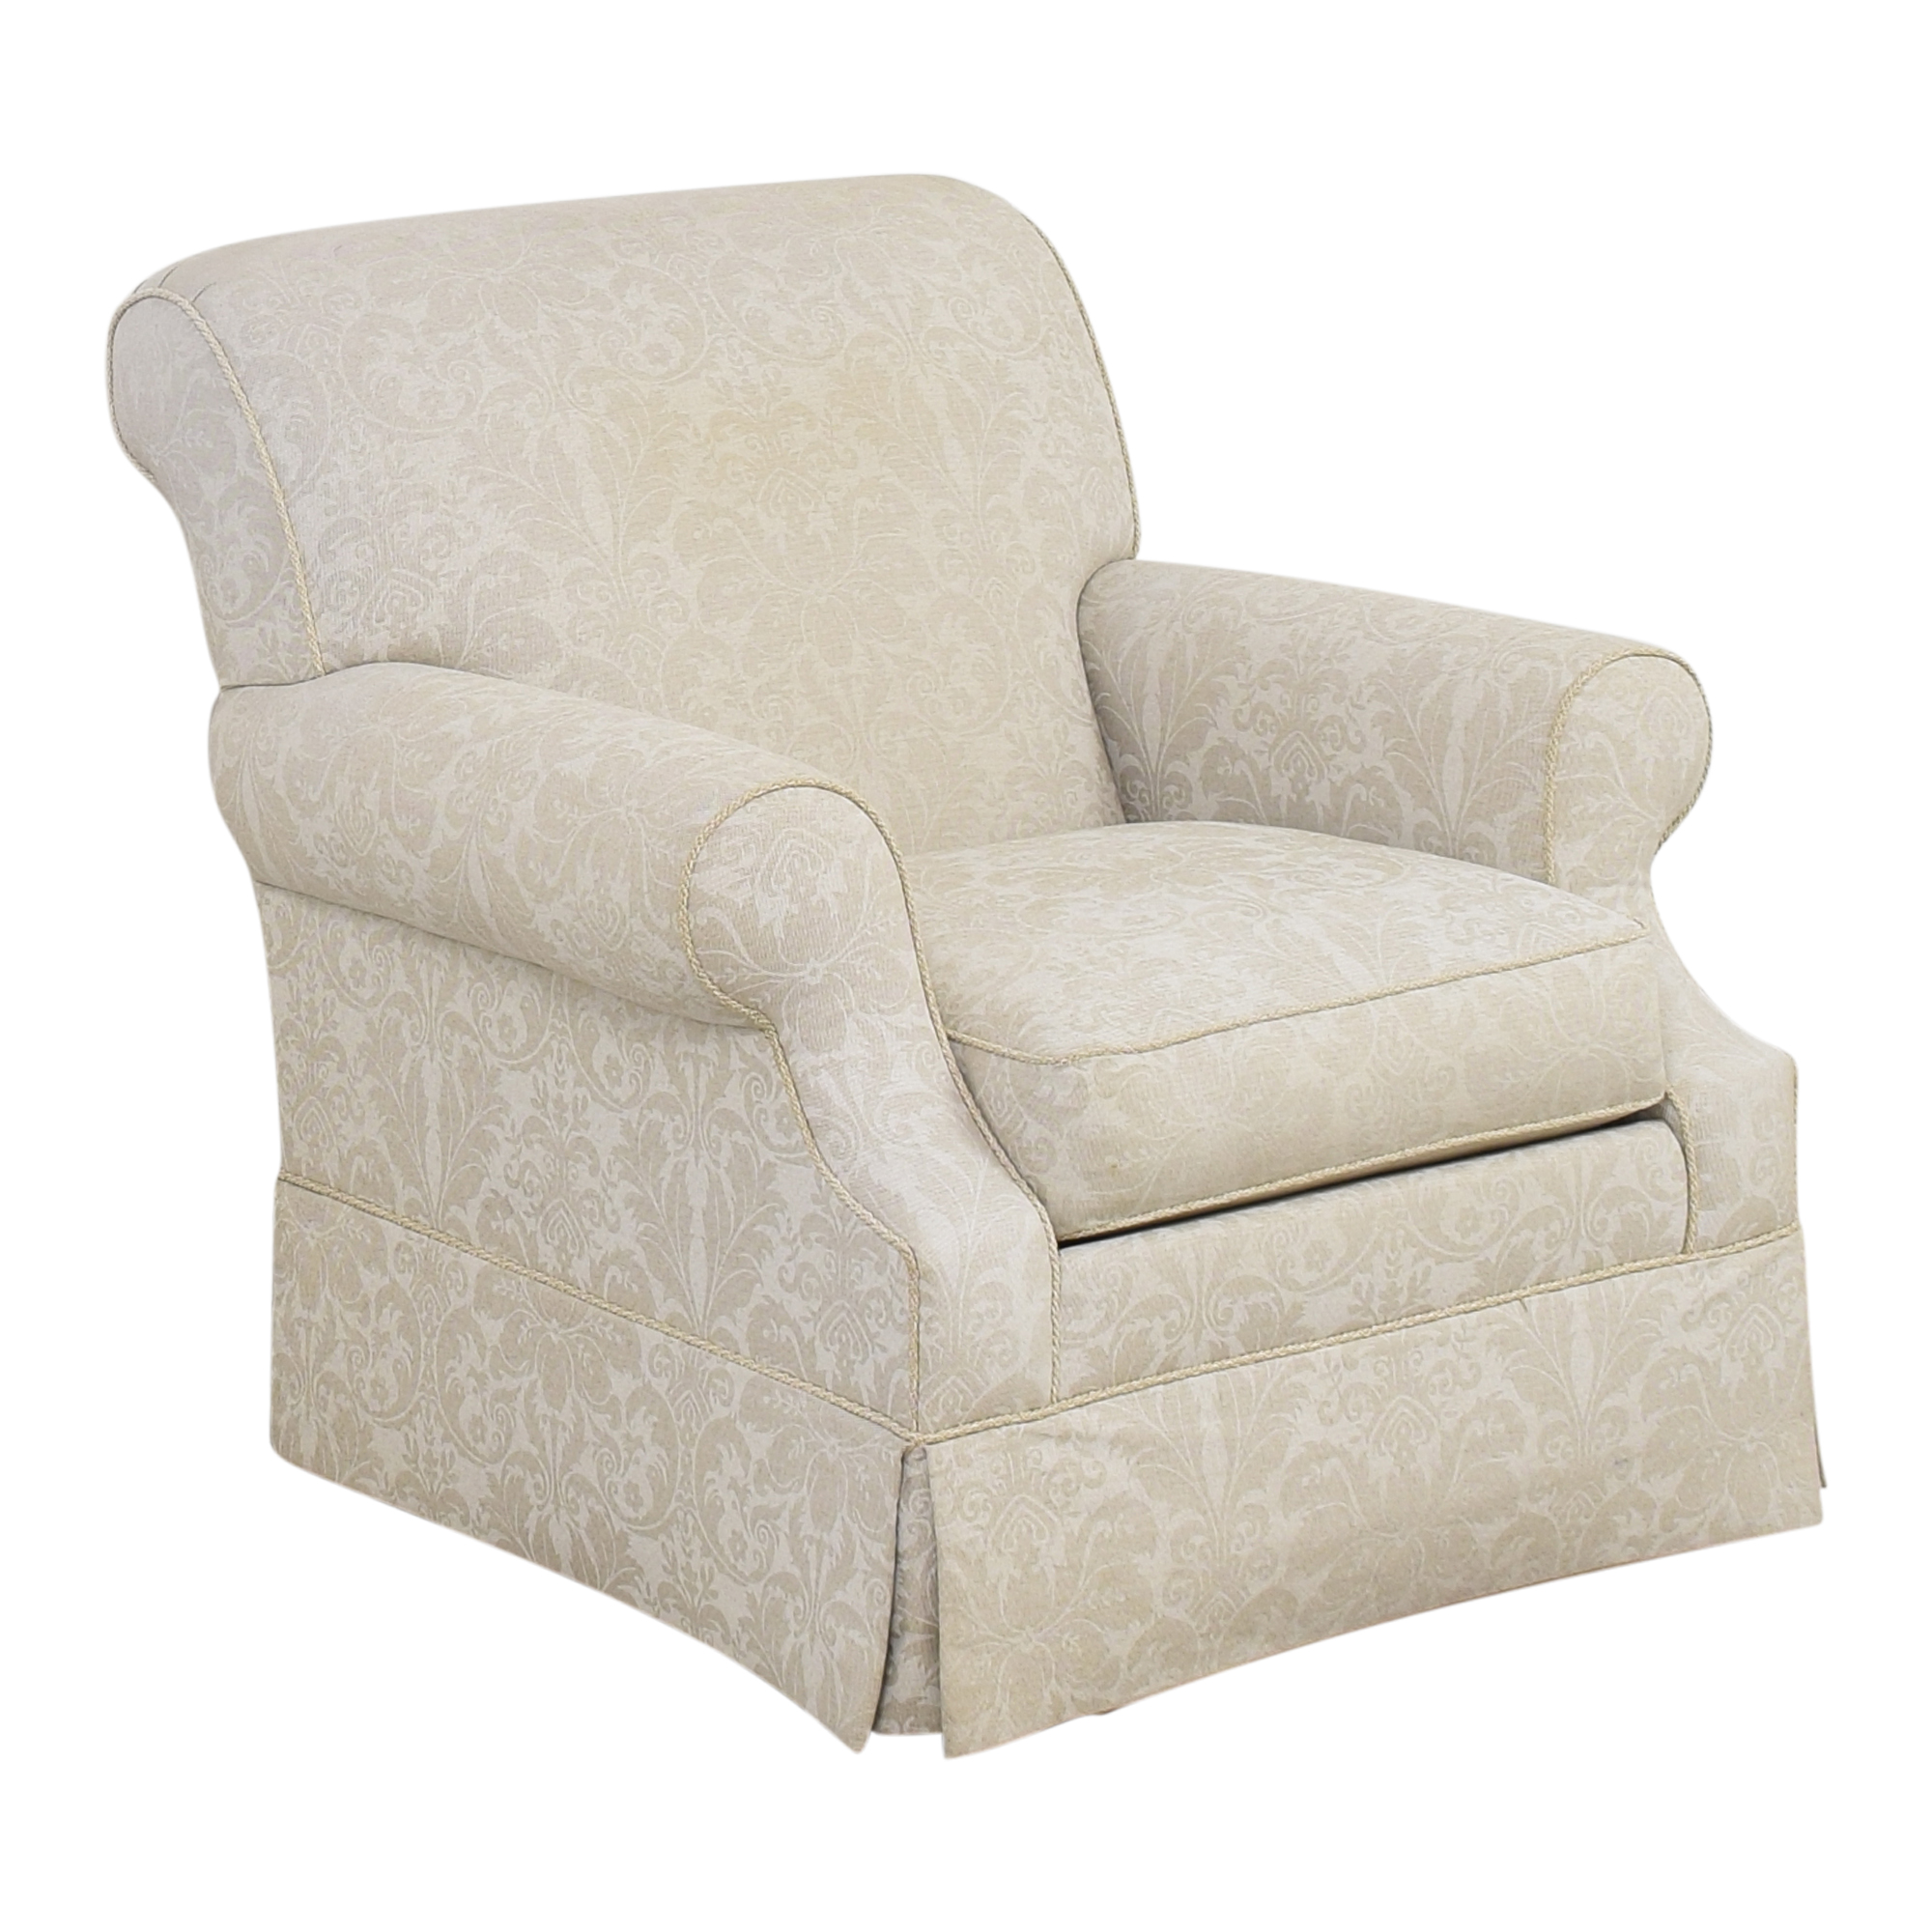 Ethan Allen Ethan Allen Damask Accent Chair price